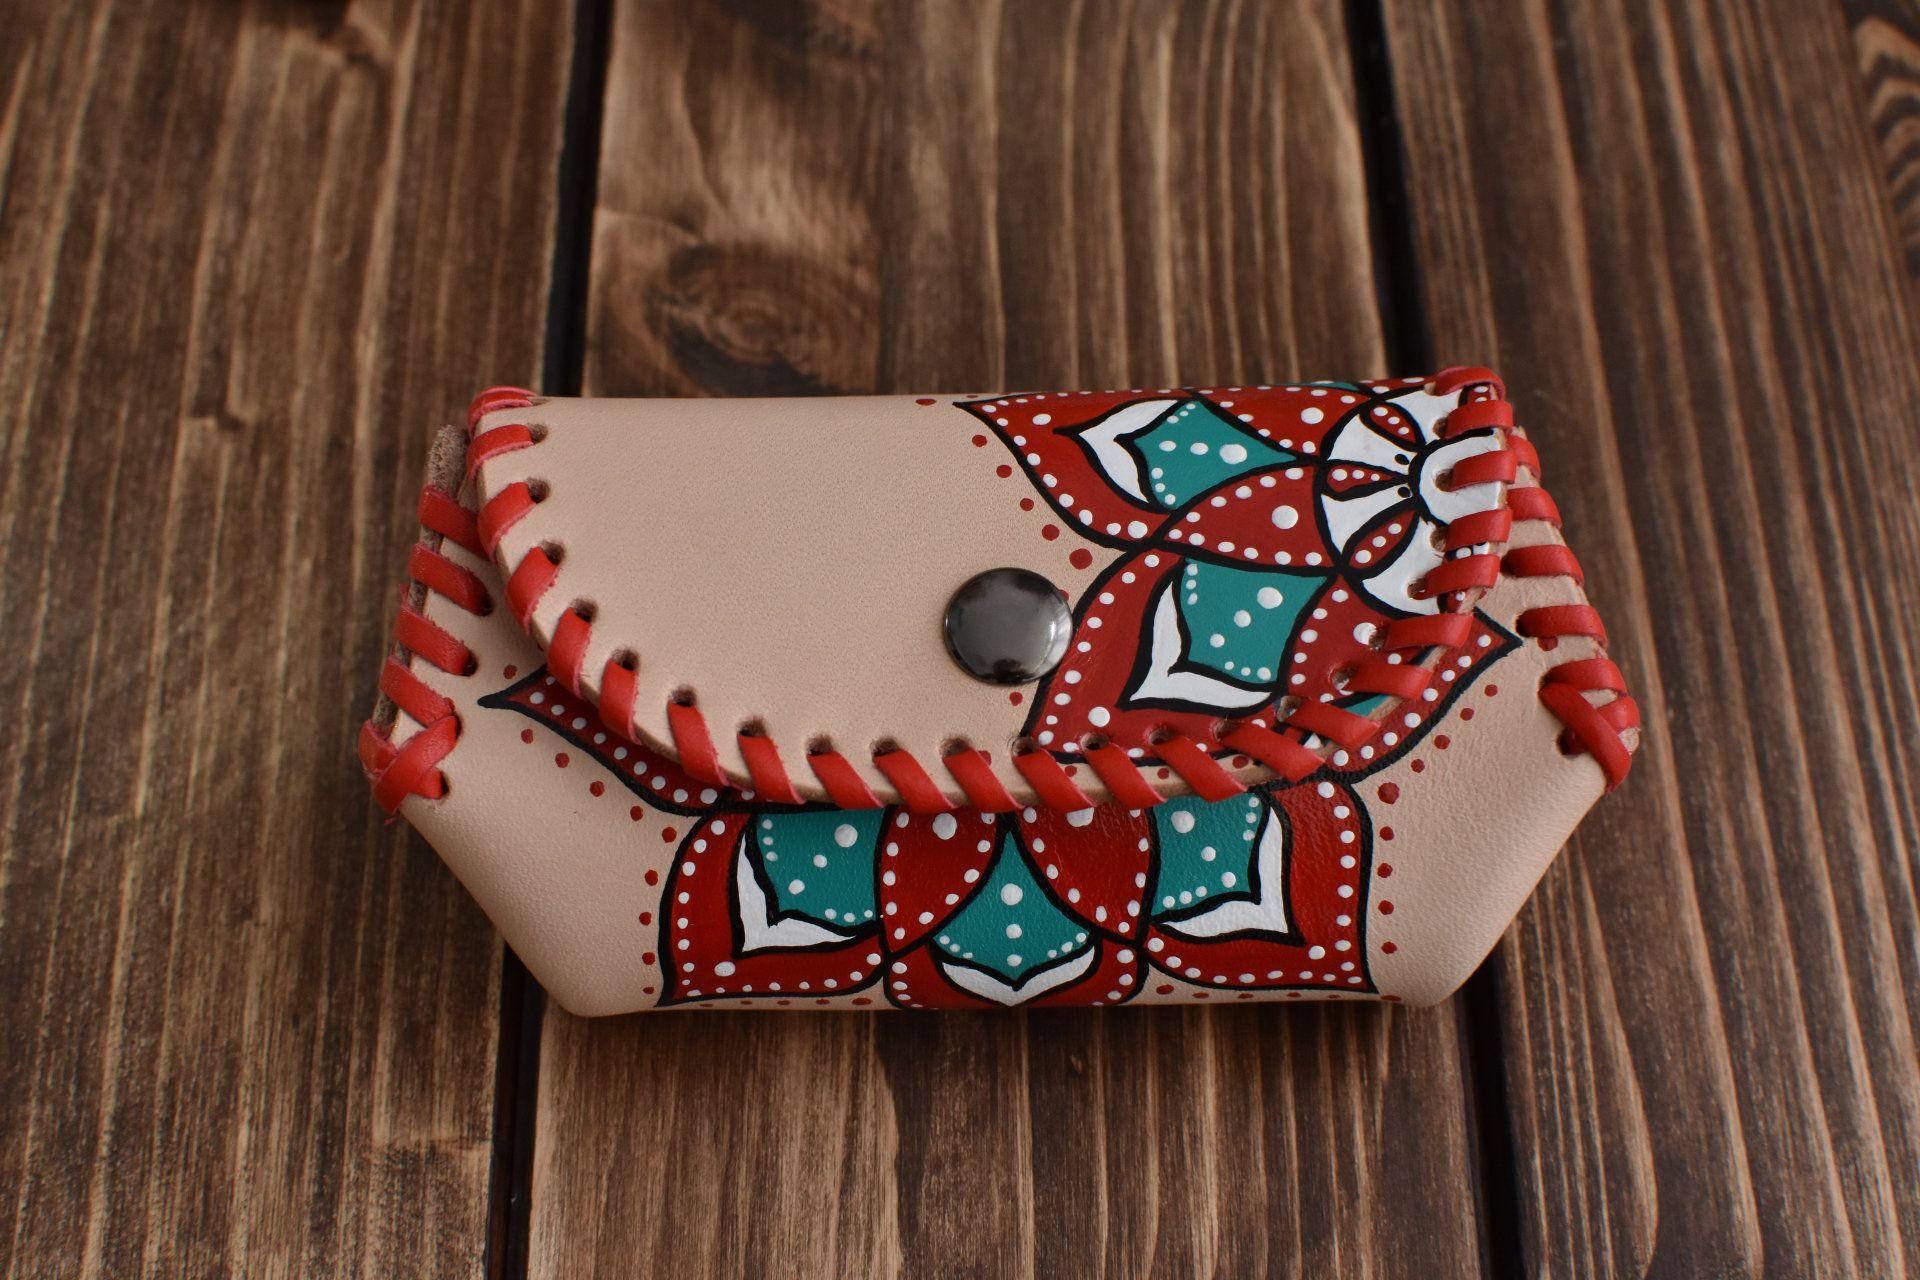 6fe7786bc #etsy #leatherwork #handmade #handpainted #coinPurse #Mandala #Accessory # Artesanal #PintadoaMano #Monedero #cuero #complementos